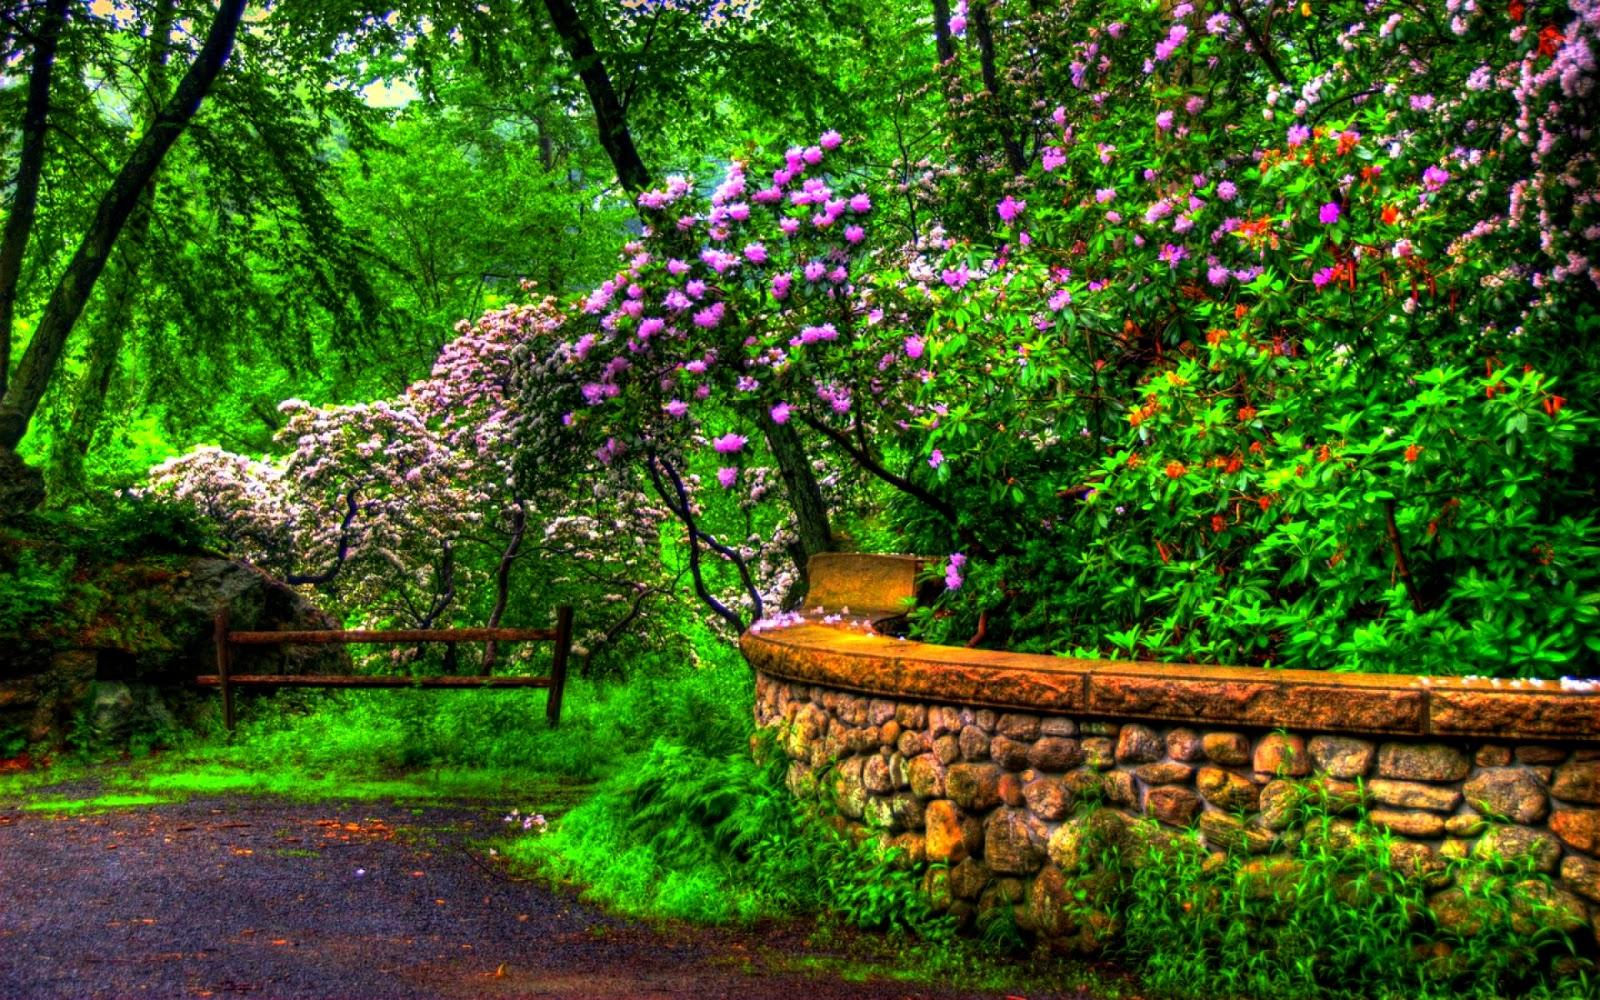 Banco de im genes 30 fotos bonitas de paisajes animales for Jardines naturales